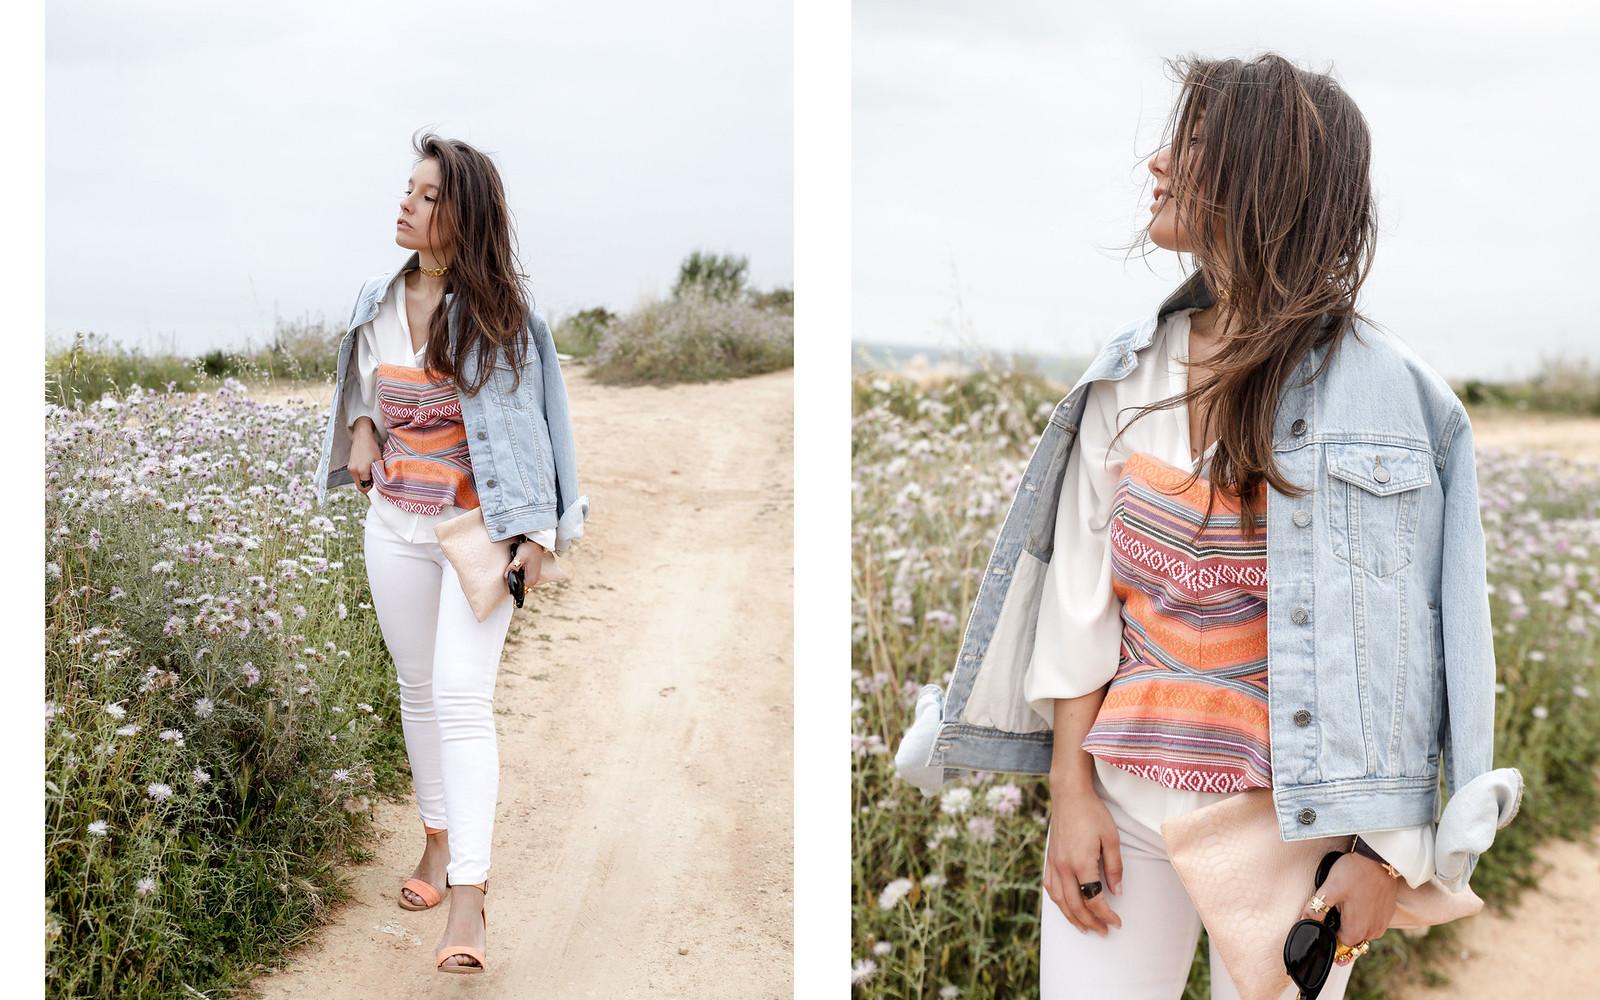 06_corset_etnico_danity_paris_theguestgirl_influencer_barcelona_laura_santolaria